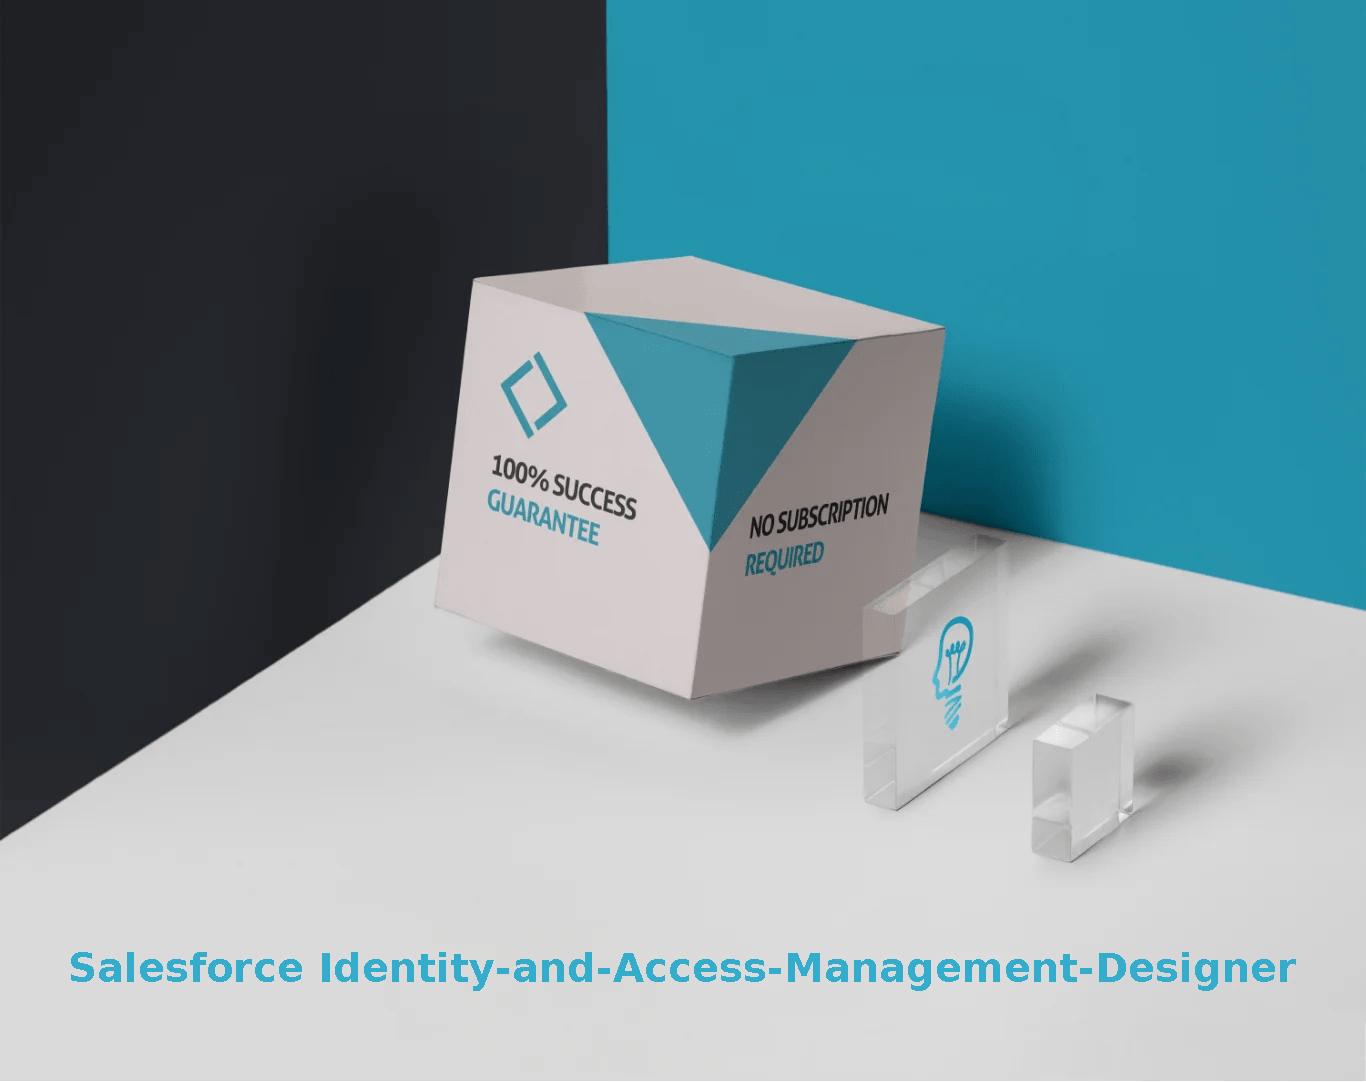 Identity-and-Access-Management-Designer Dumps